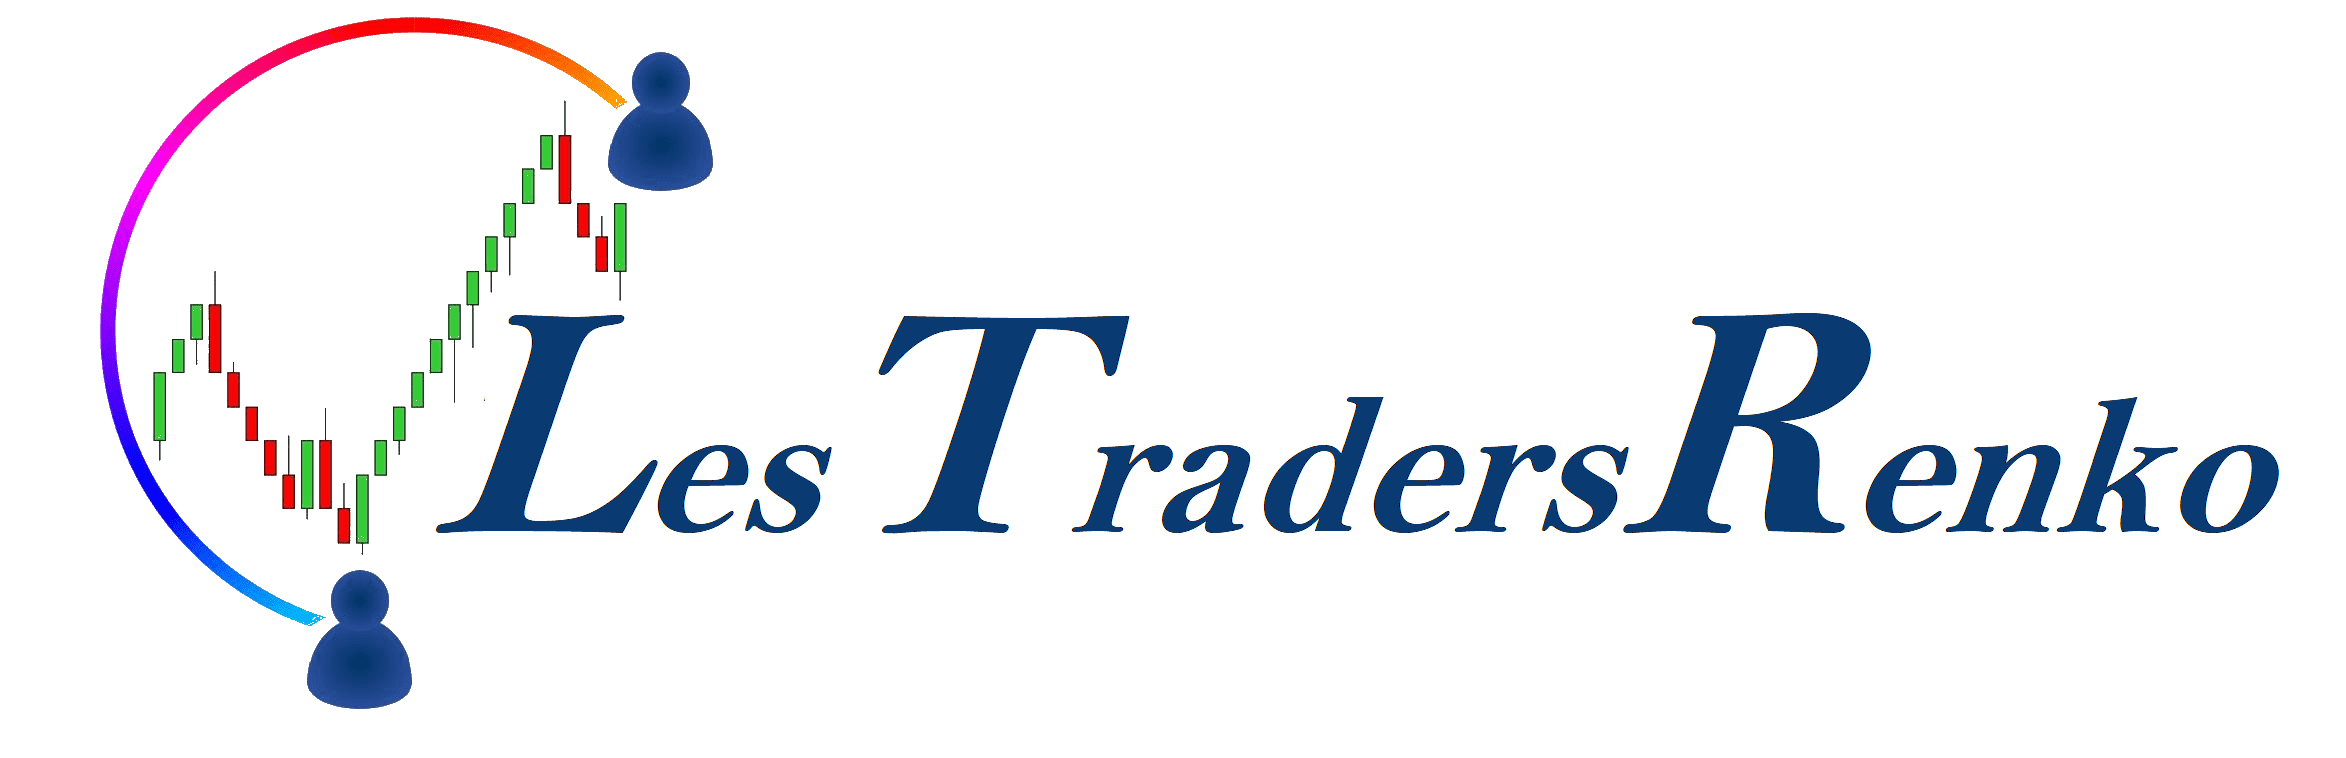 Les Traders Renko